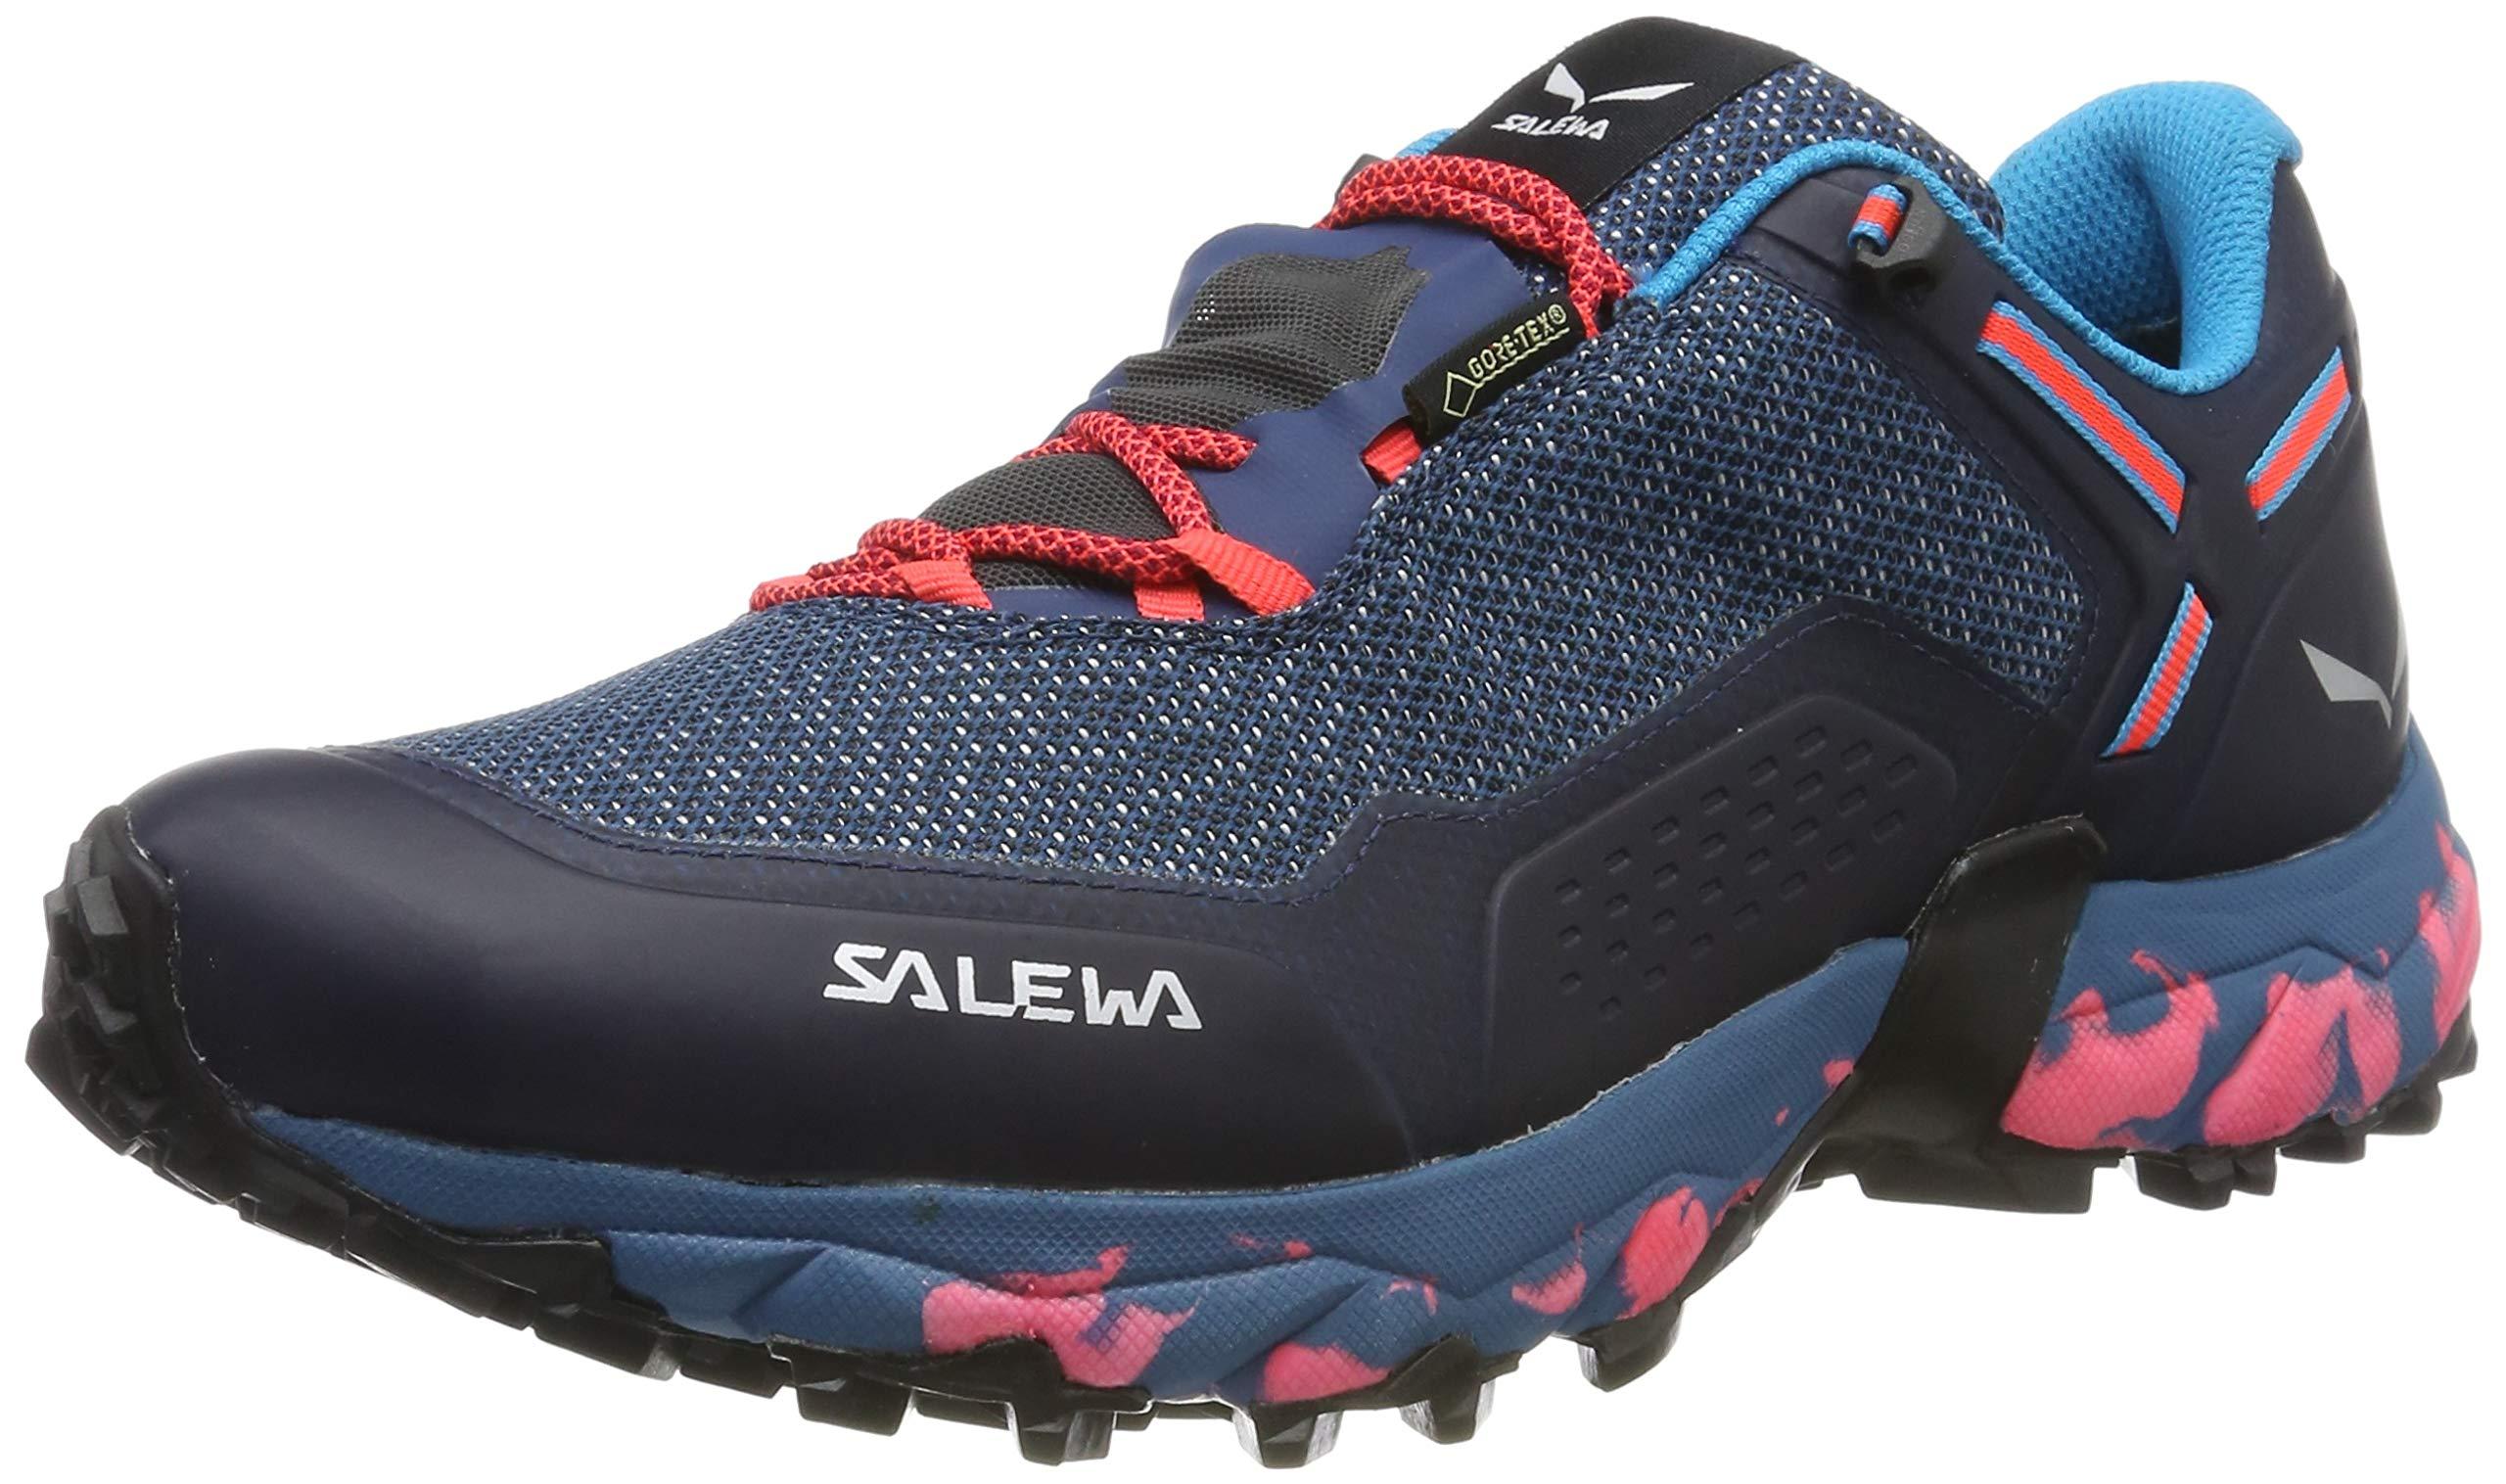 Salewa Damen WS Speed Beat Gore-TEX Traillaufschuhe, Patriot Blue/Fluo Coral, 37